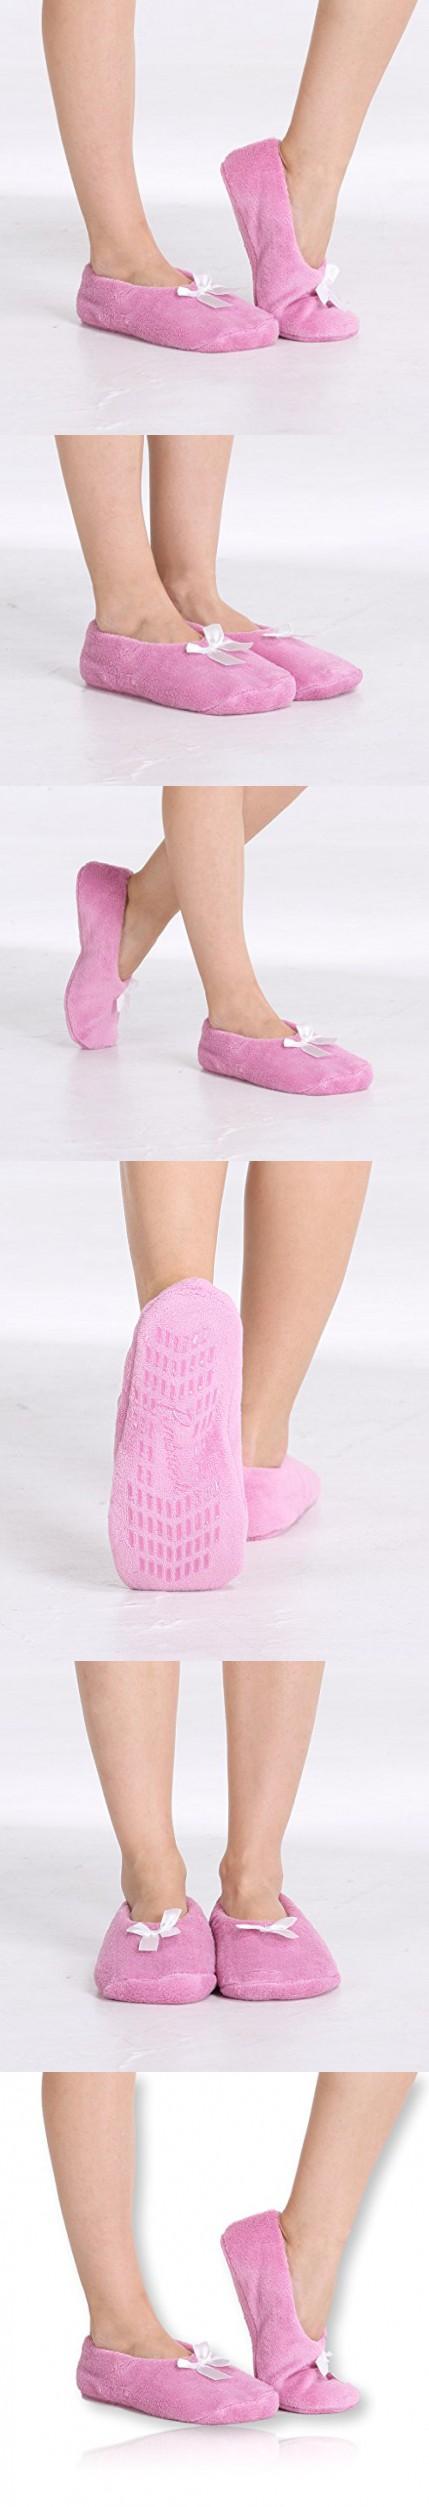 pembrook fuzzy soft coral fleece slippers pink medium 7 8